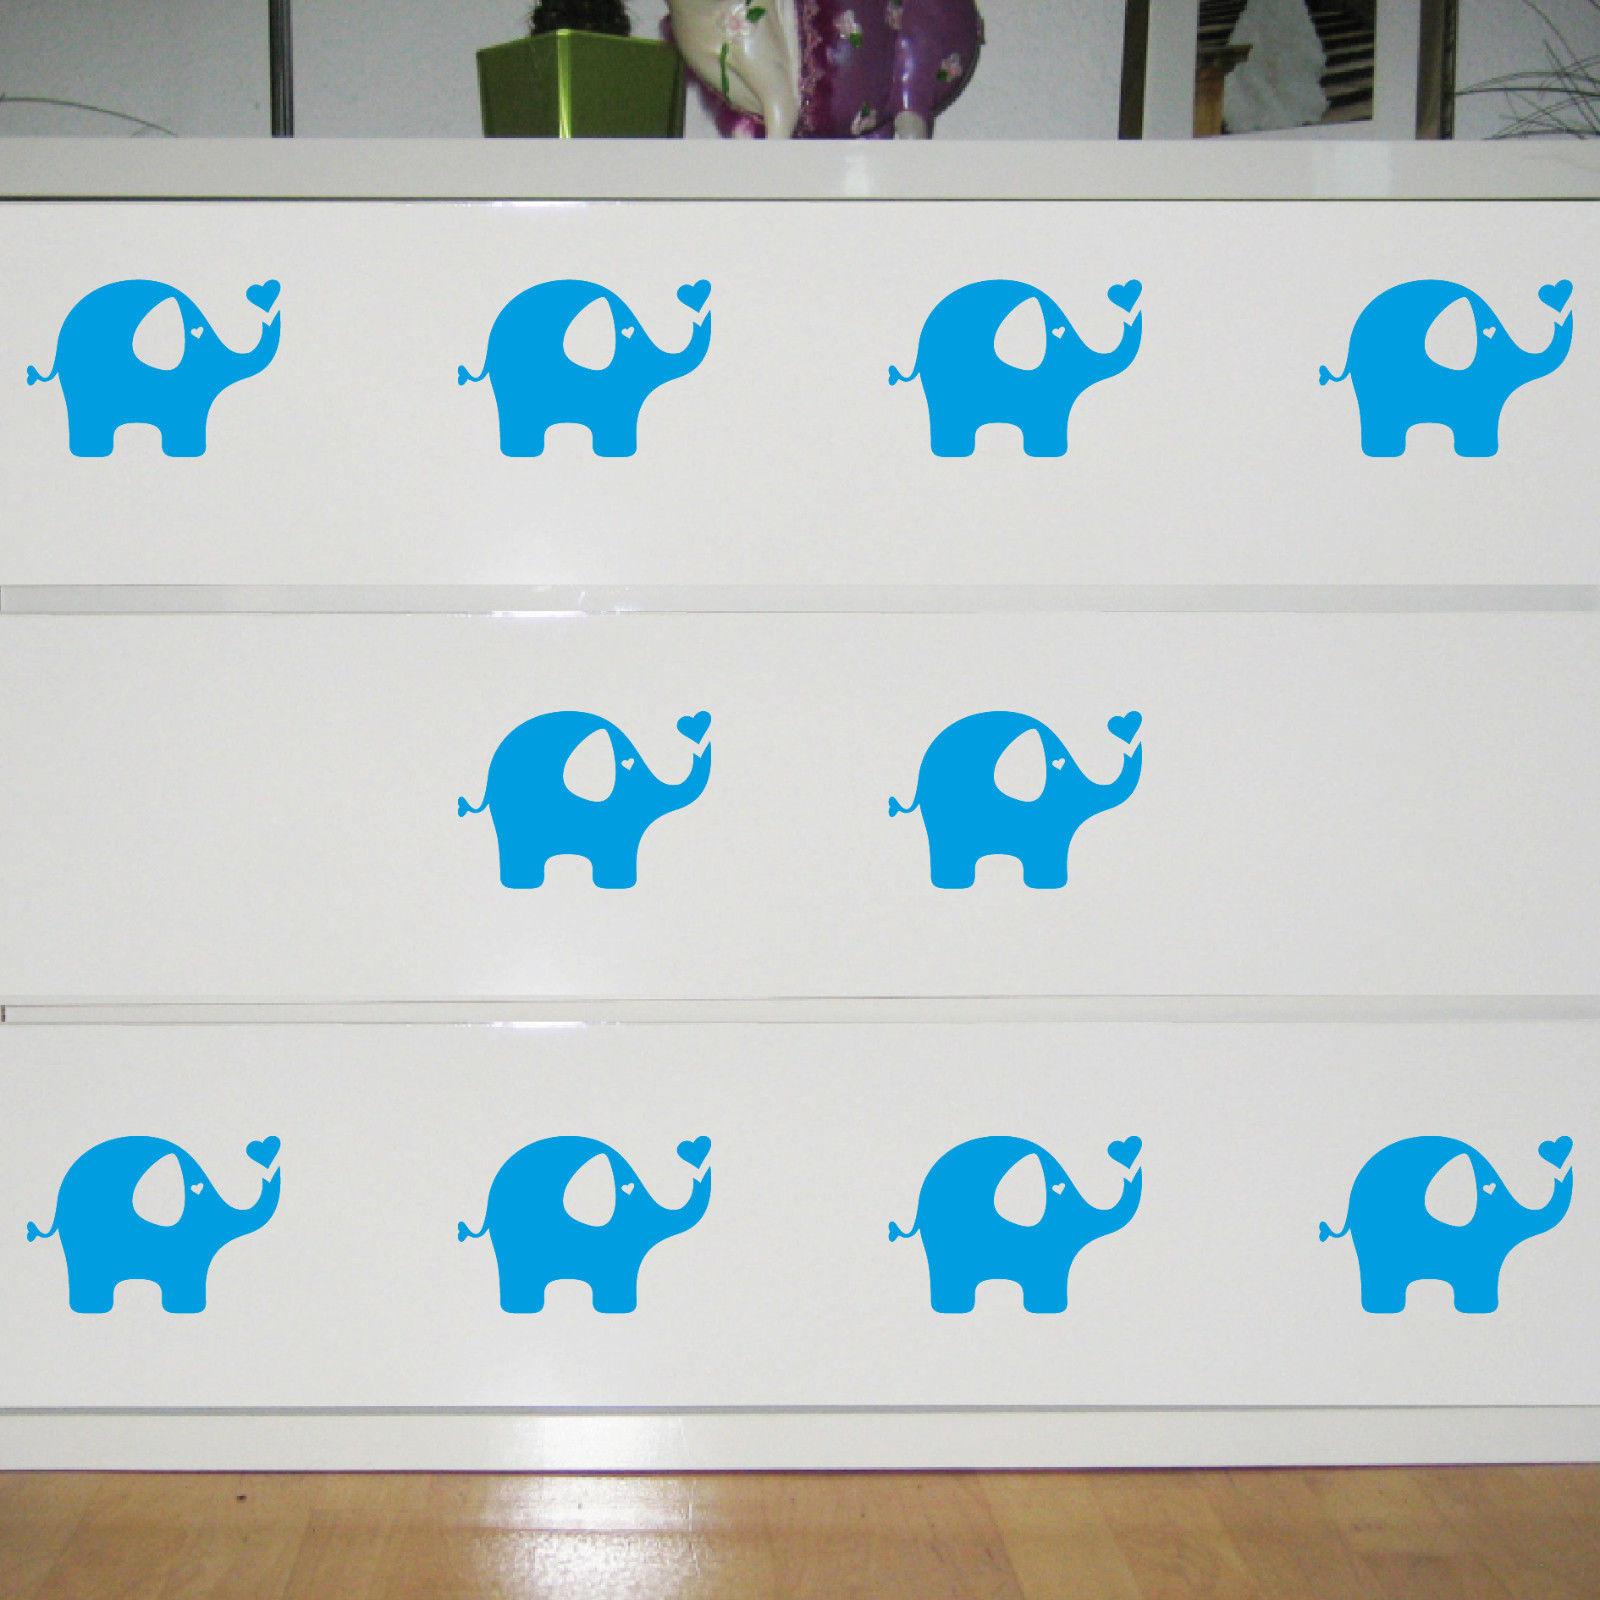 10 aufkleber elefant hellblau dumbo 10cm tattoo folie kinder zimmer m bel deko kaufen bei green it. Black Bedroom Furniture Sets. Home Design Ideas